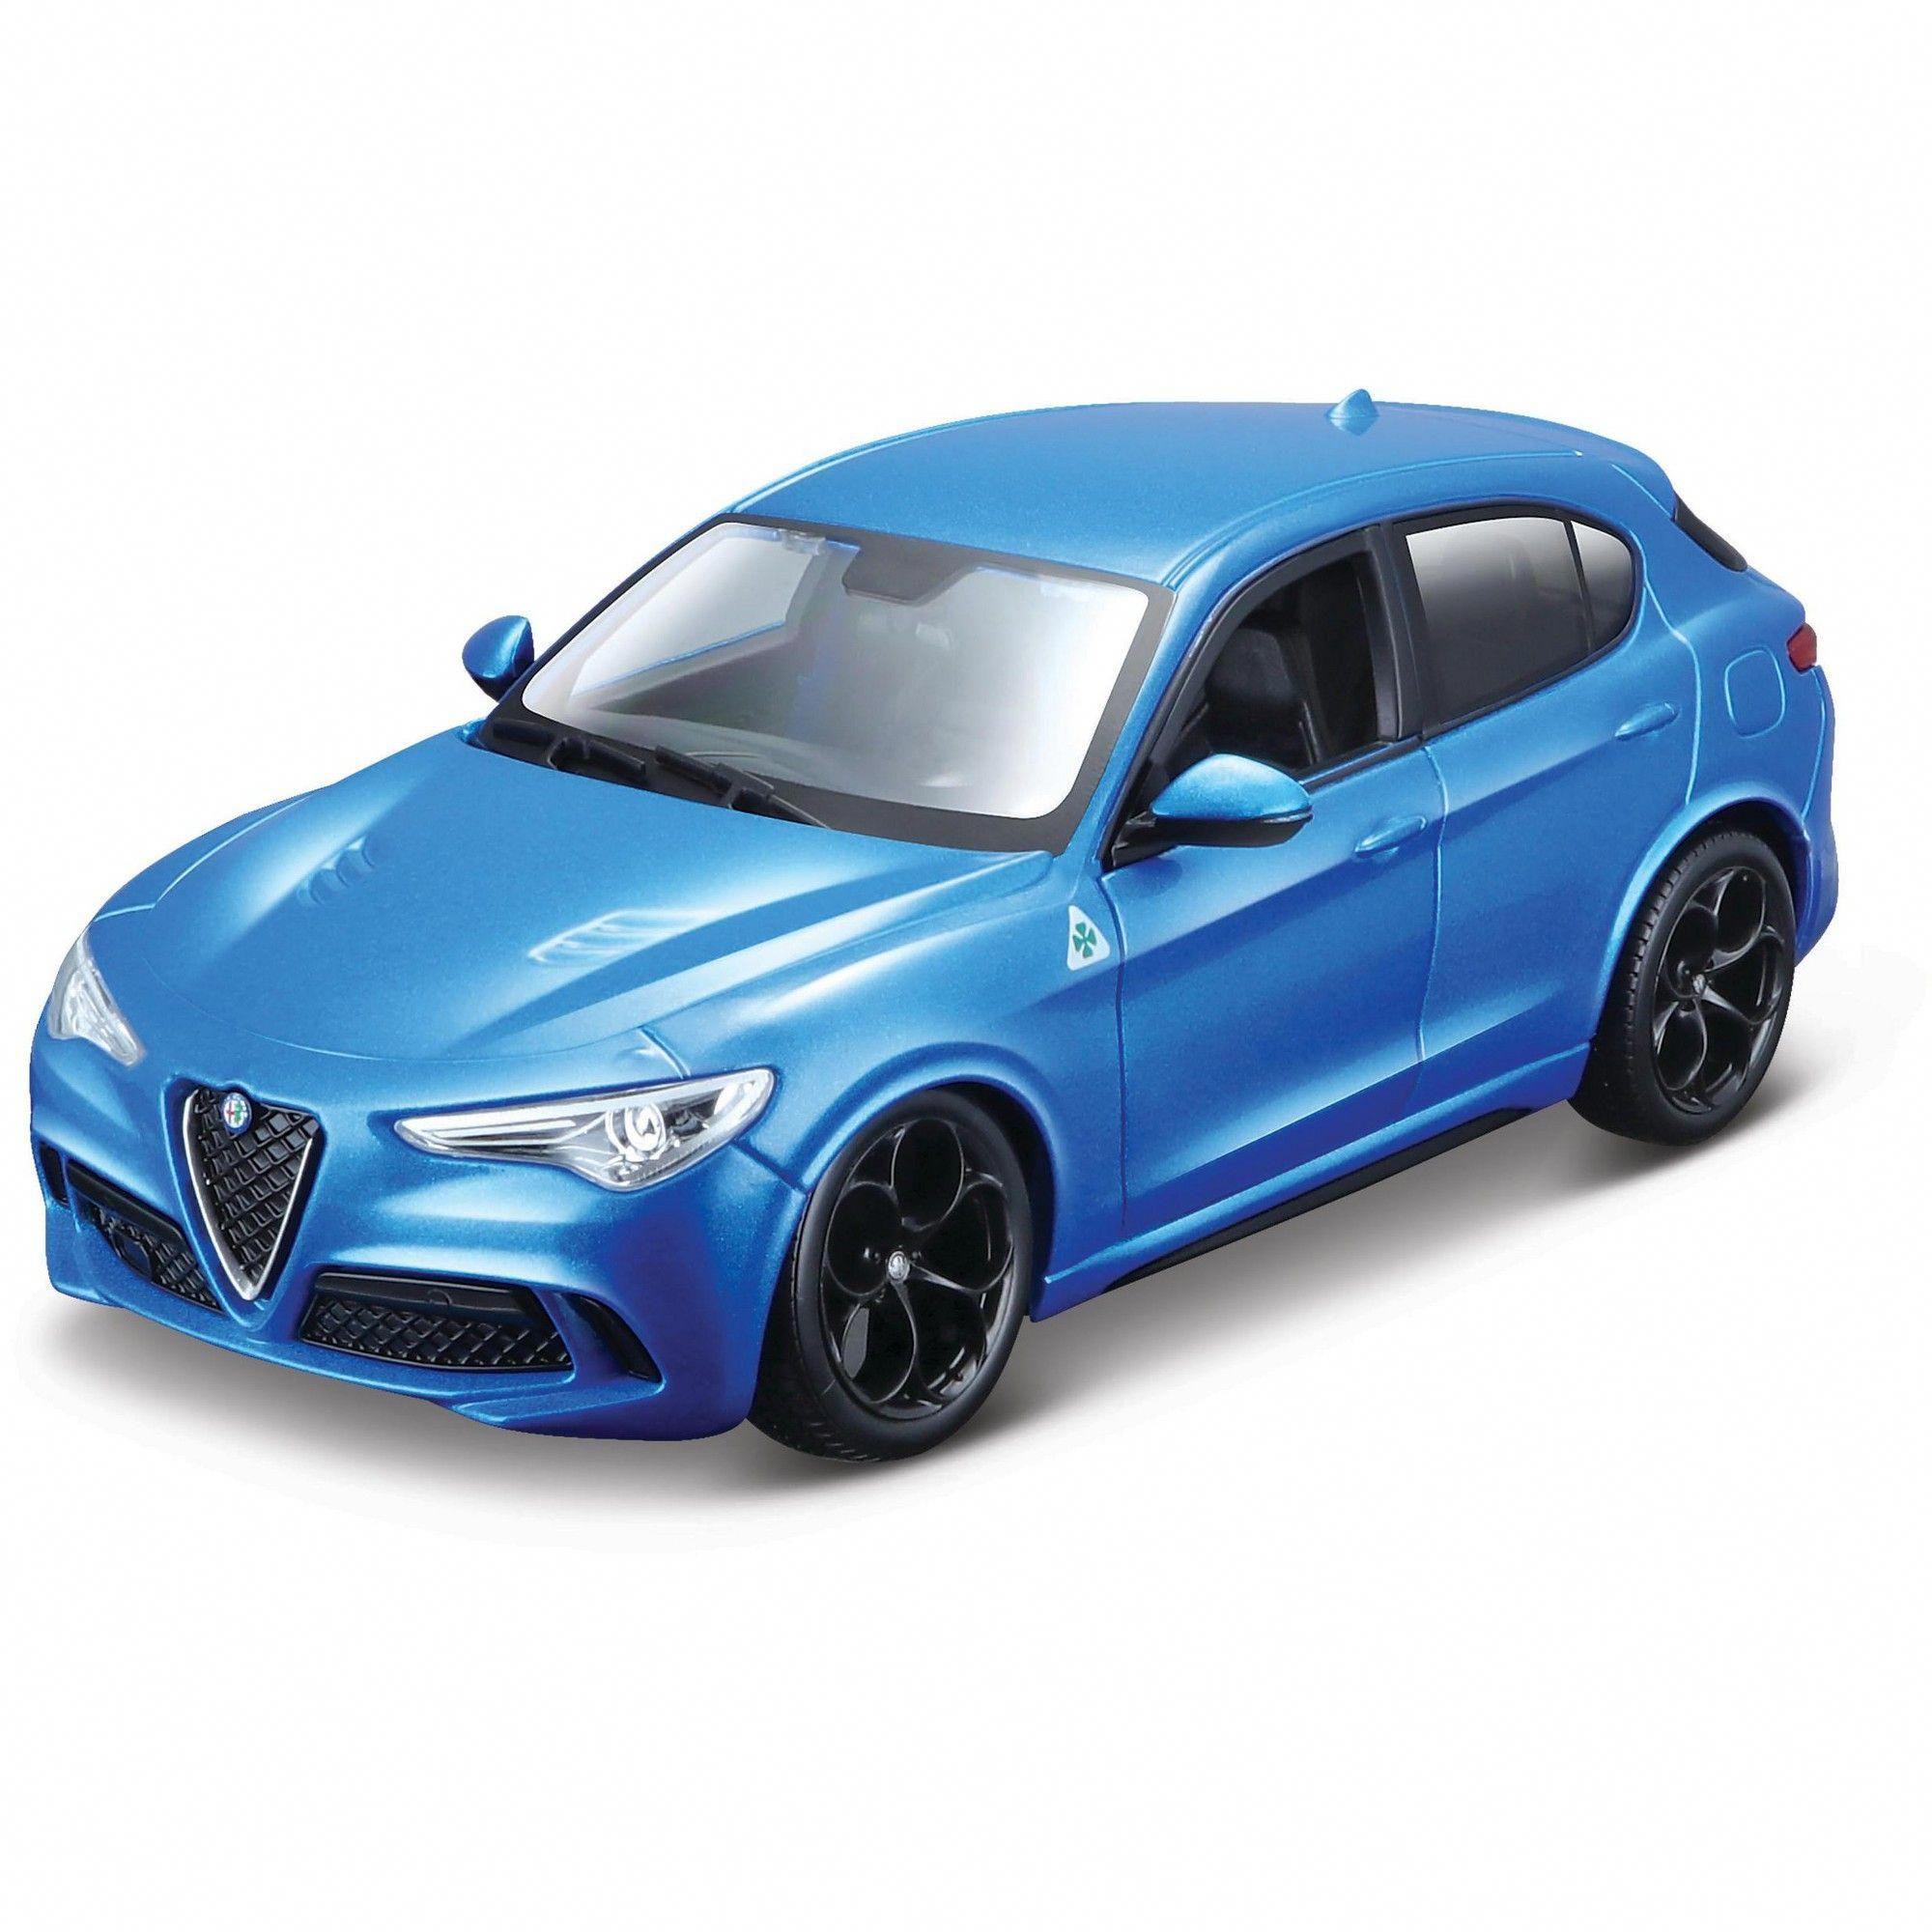 Alfa Romeo Stelvio Quadrifoglio Blue 1 24 Diecast Model Car By Bburago Ferraripink Sports Cars Luxury Diecast Model Cars Alfa Romeo